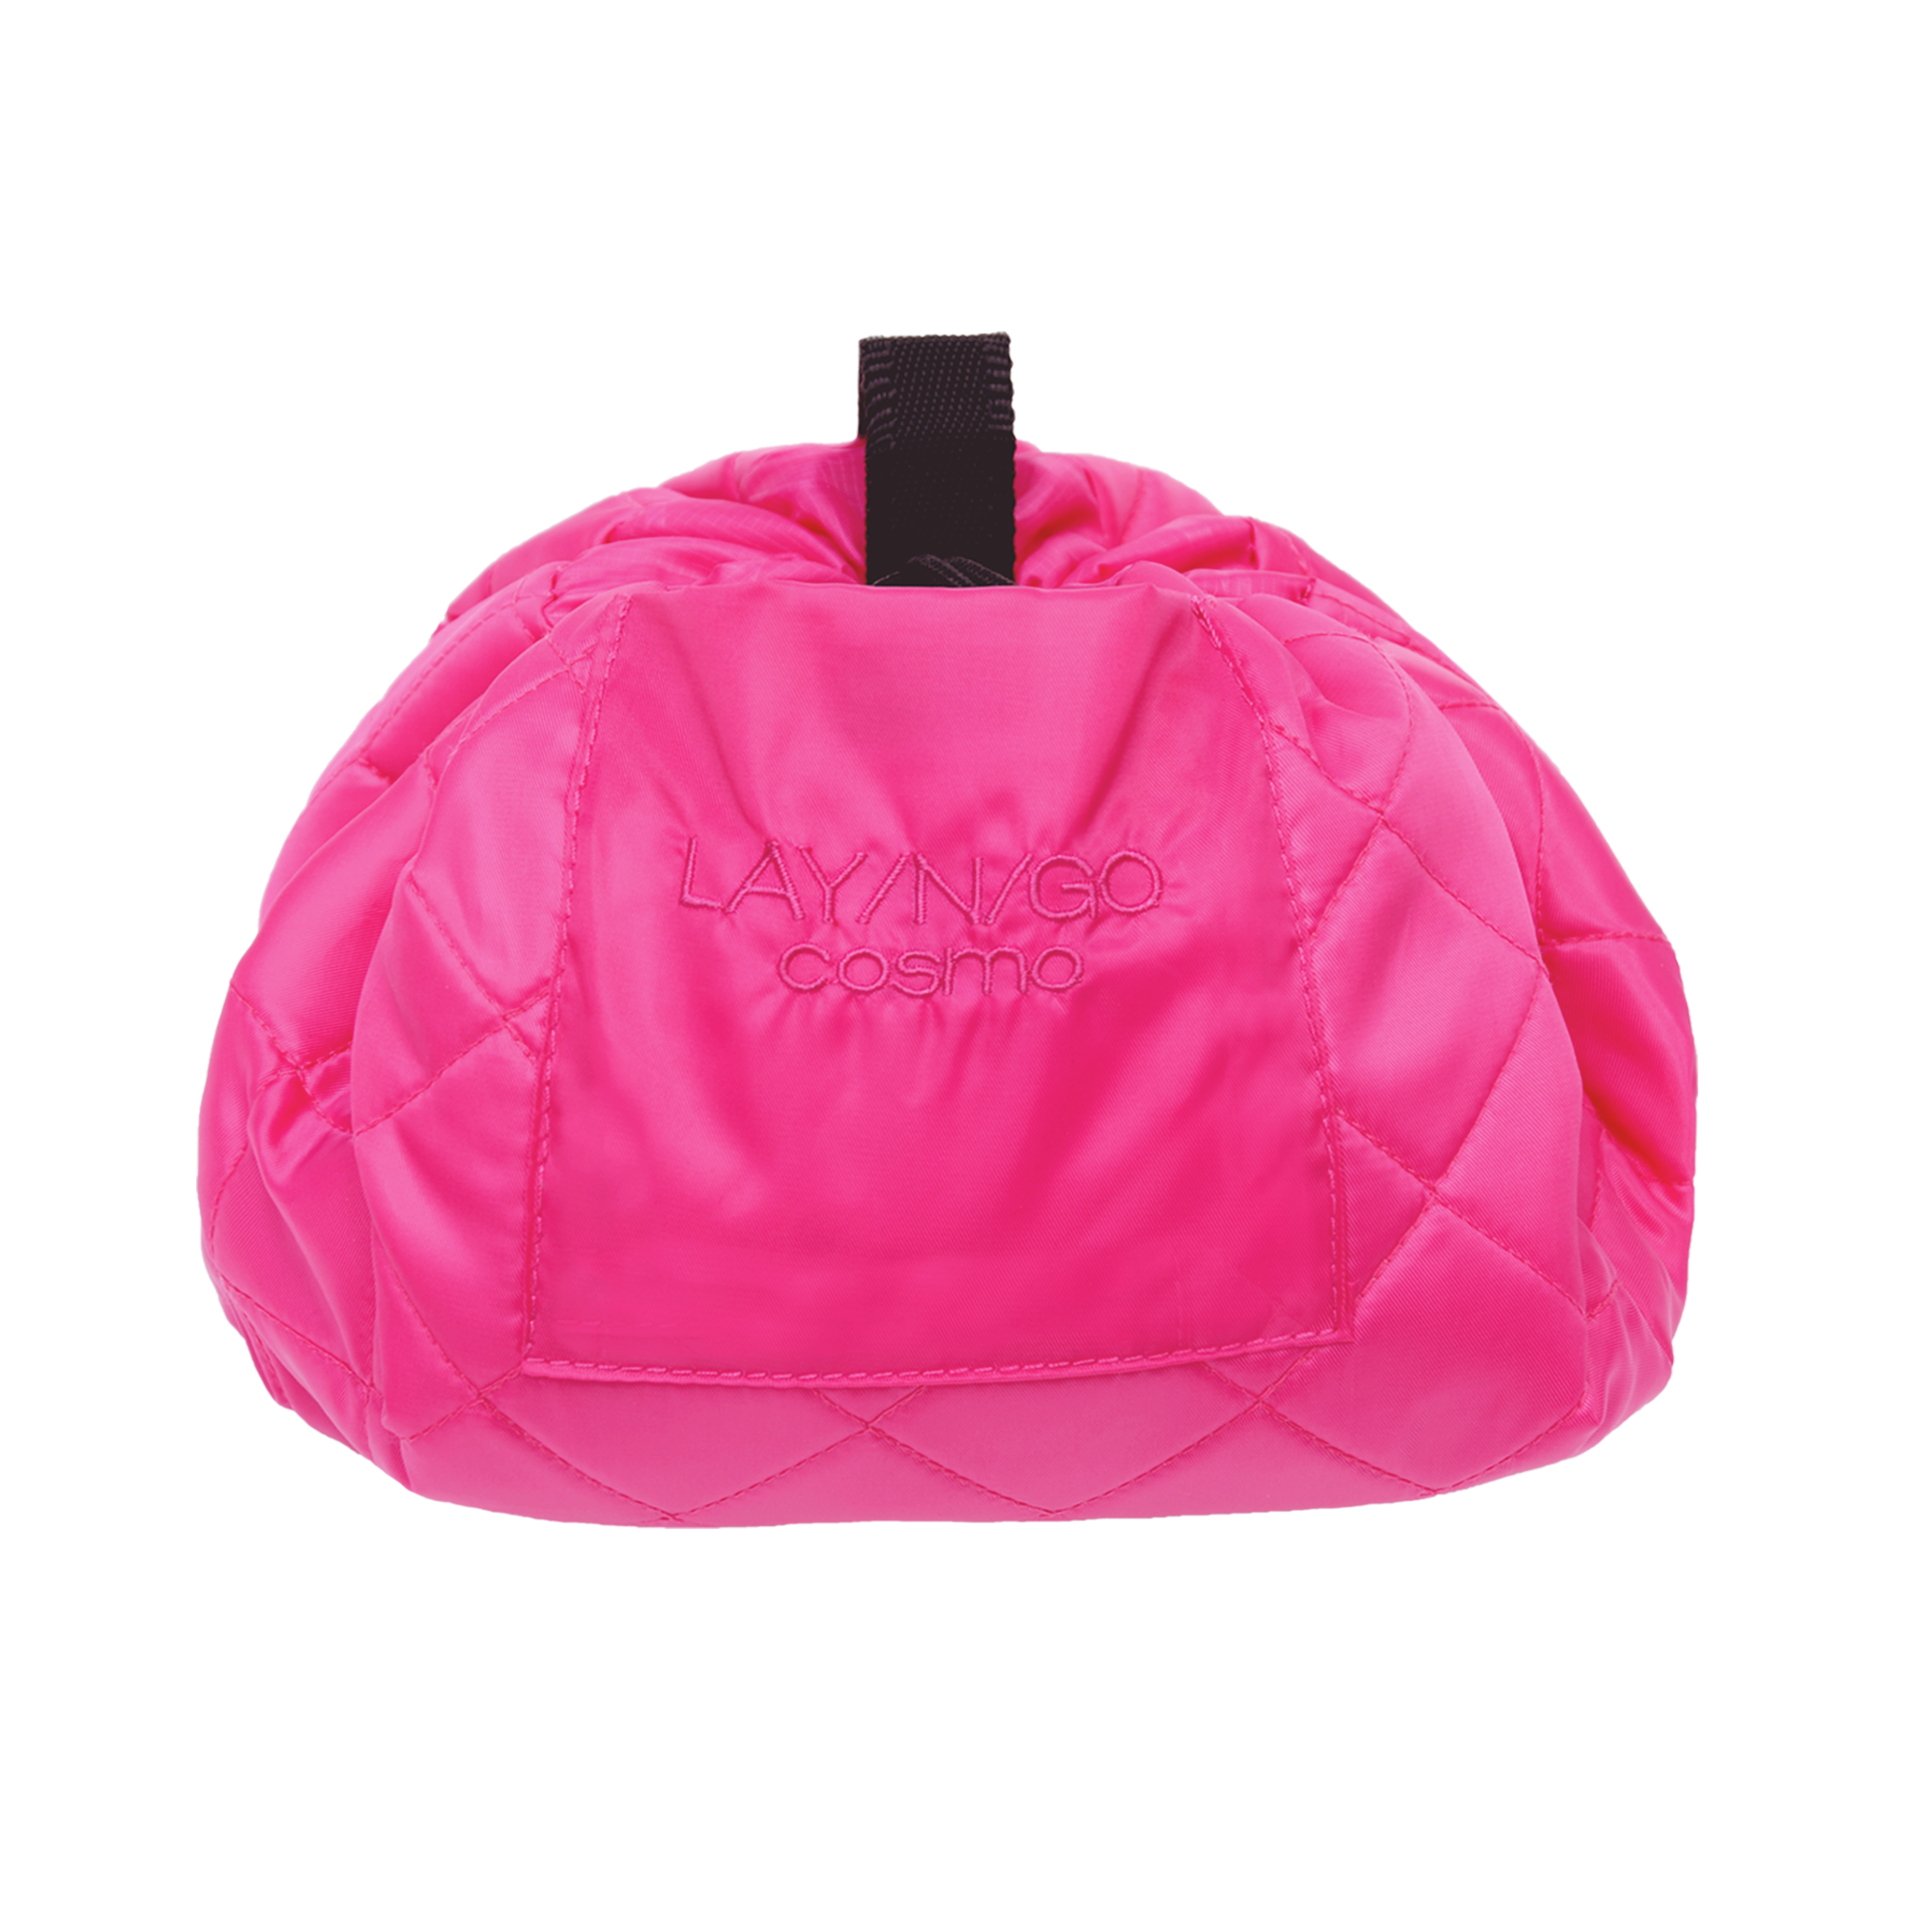 Lay and Go Original Drawstring Cosmetic Bag Cosmetic